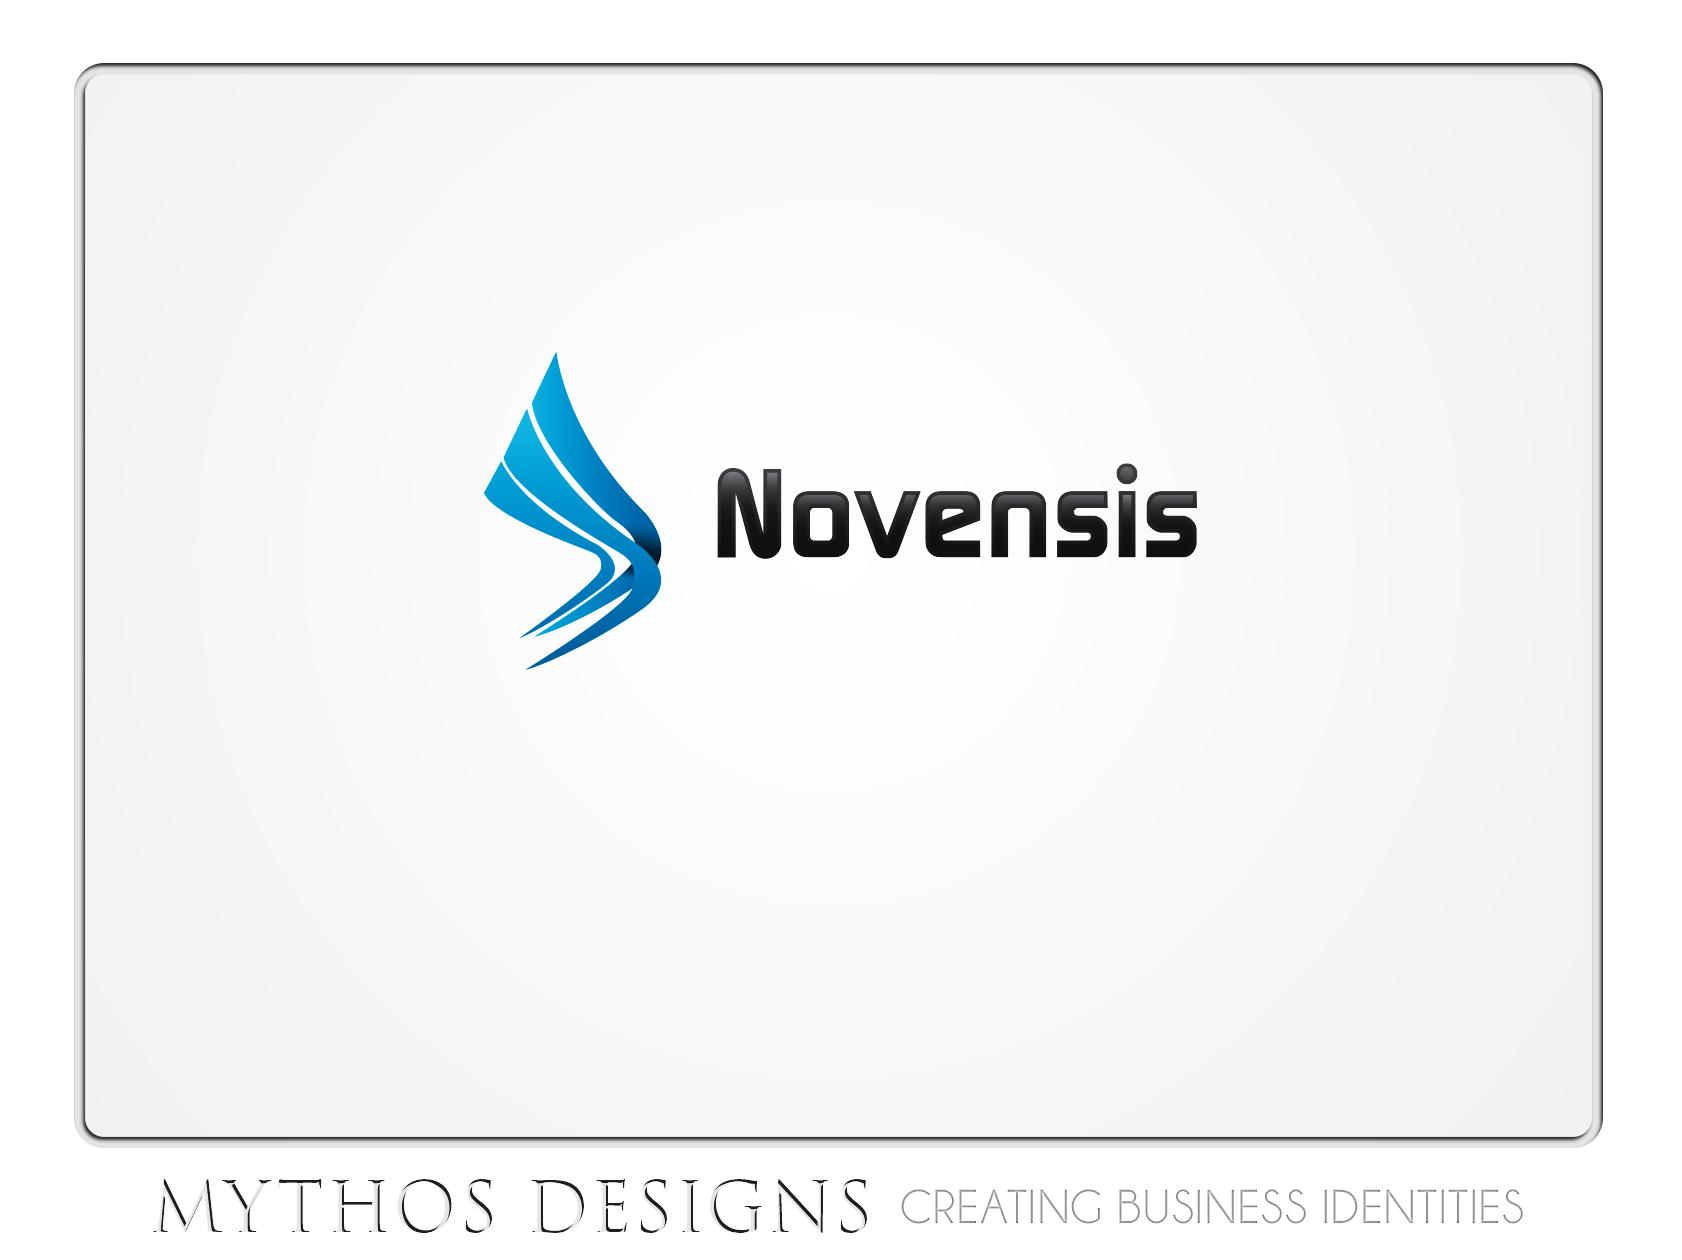 Logo Design by OmegaDesigns - Entry No. 96 in the Logo Design Contest Novensis Logo Design.